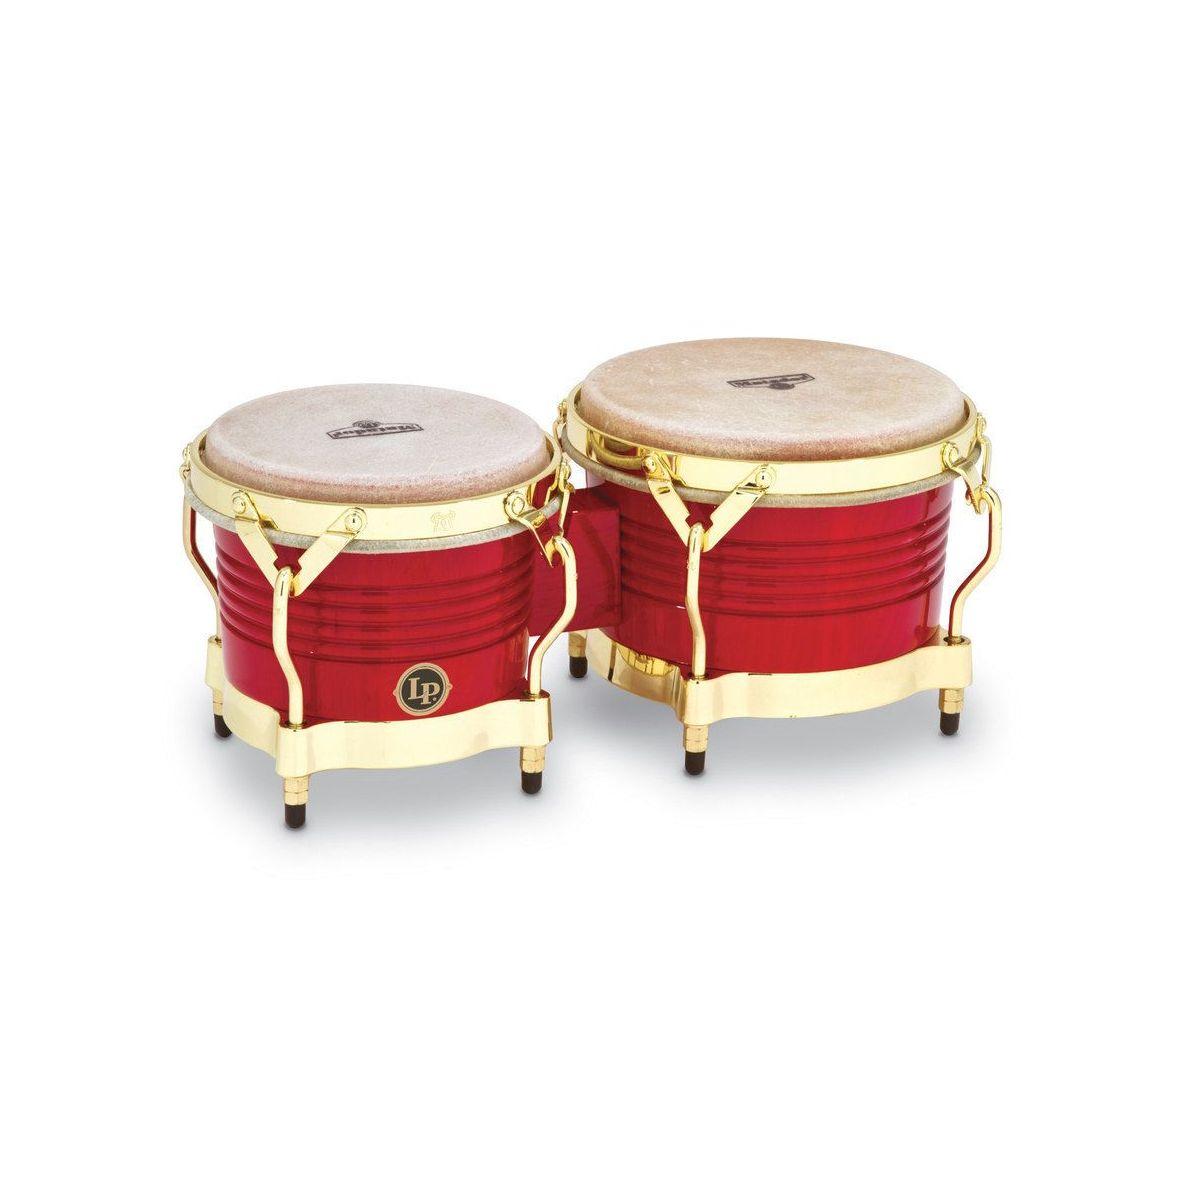 "Bongo LP Matador M201-RW 7 1/4""+ 8 5/8"" red gold"